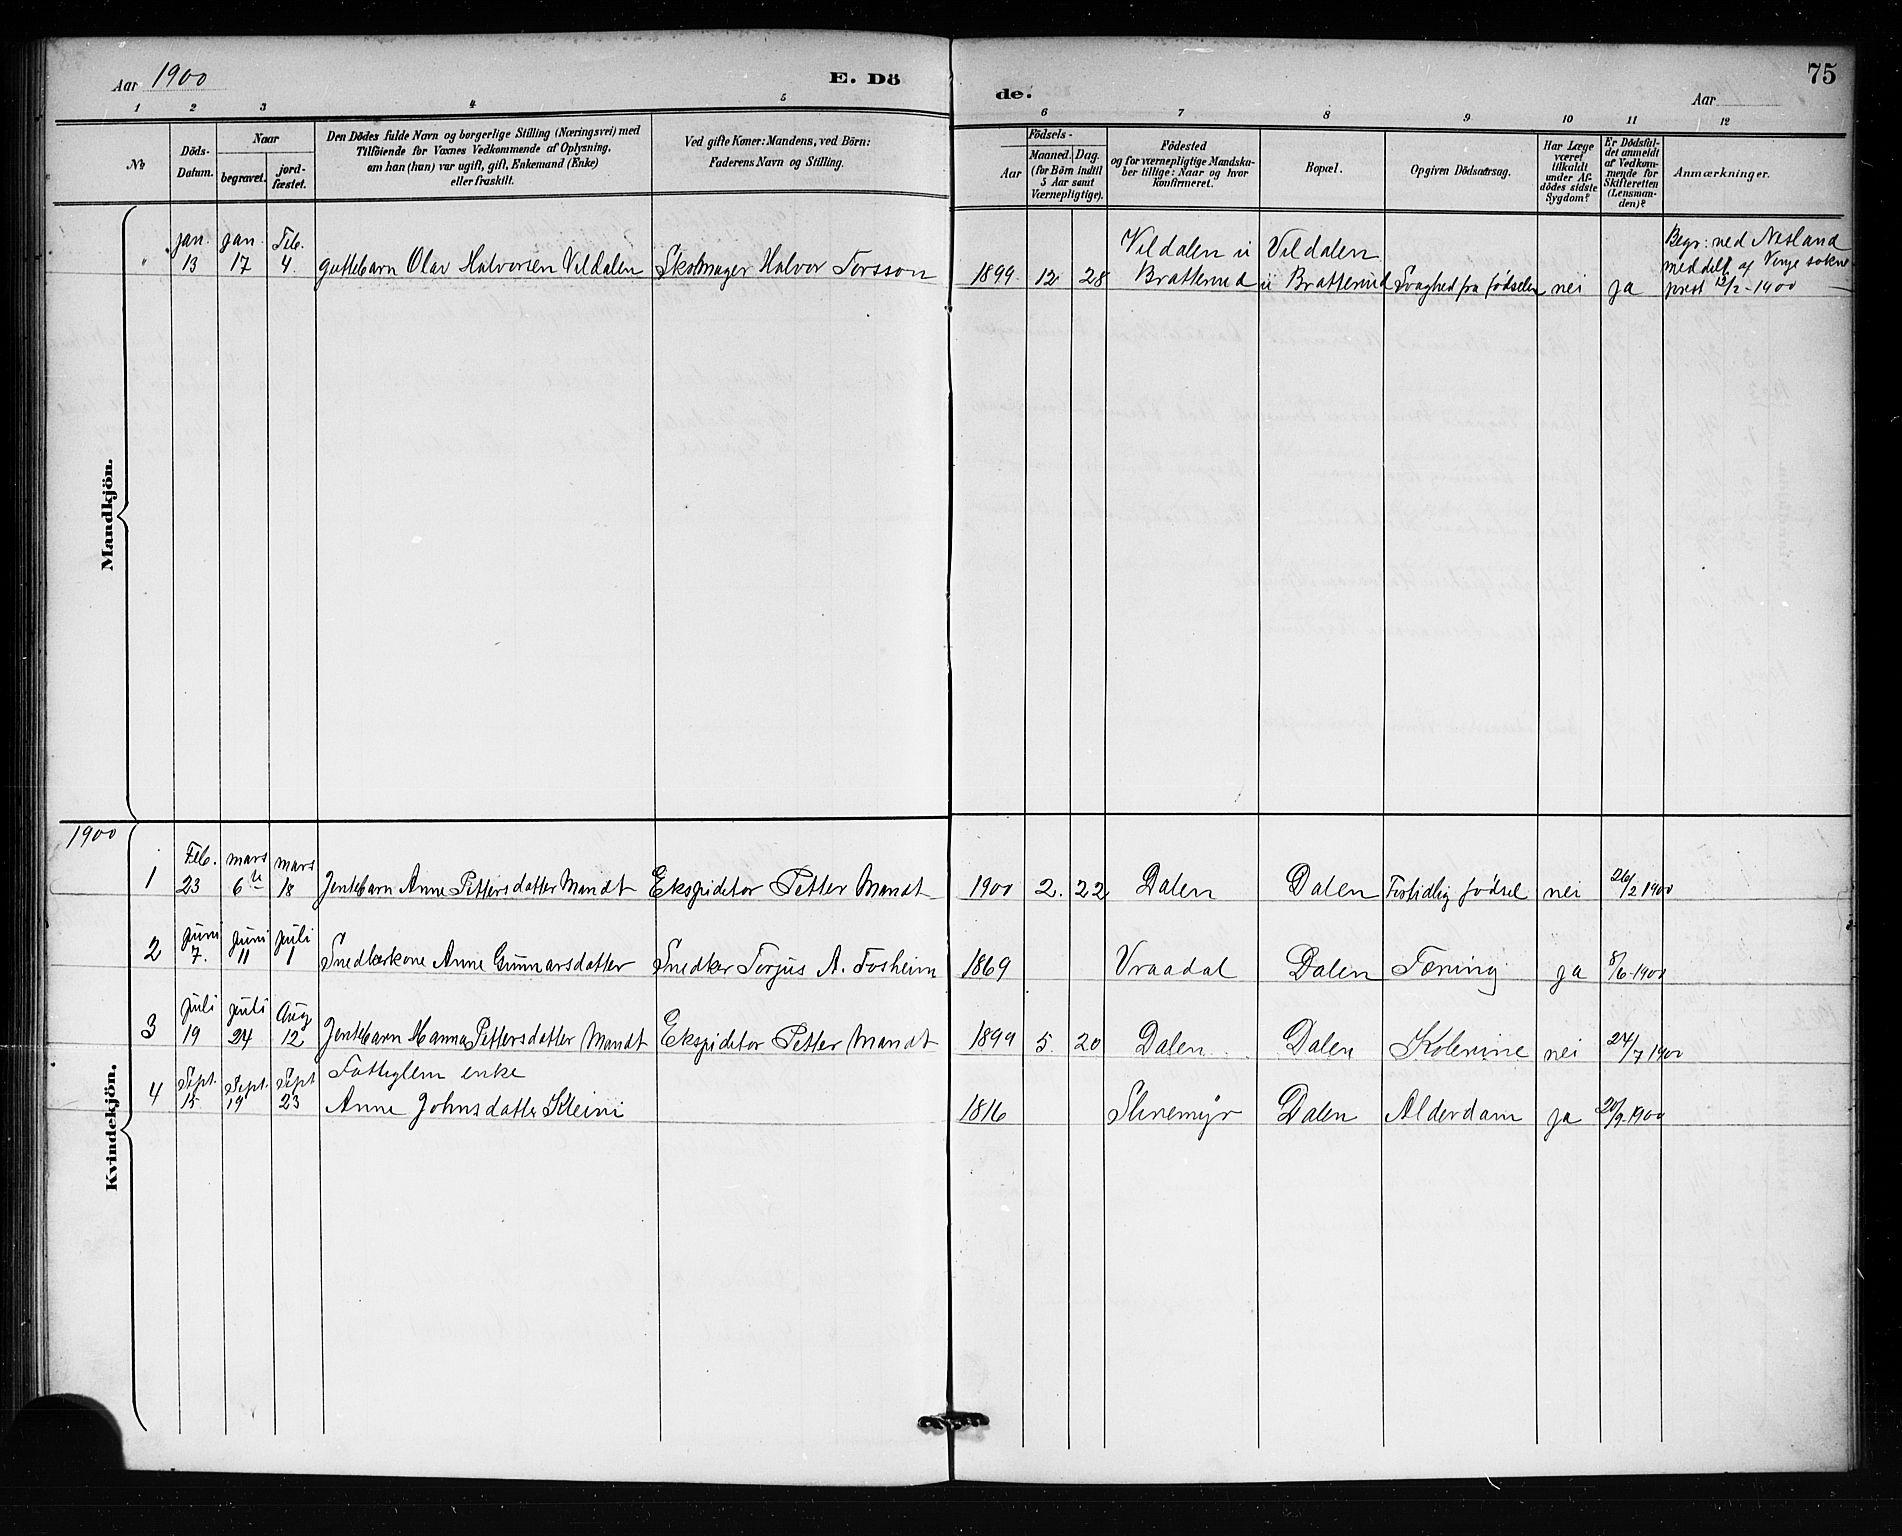 SAKO, Lårdal kirkebøker, G/Gb/L0003: Klokkerbok nr. II 3, 1889-1920, s. 75